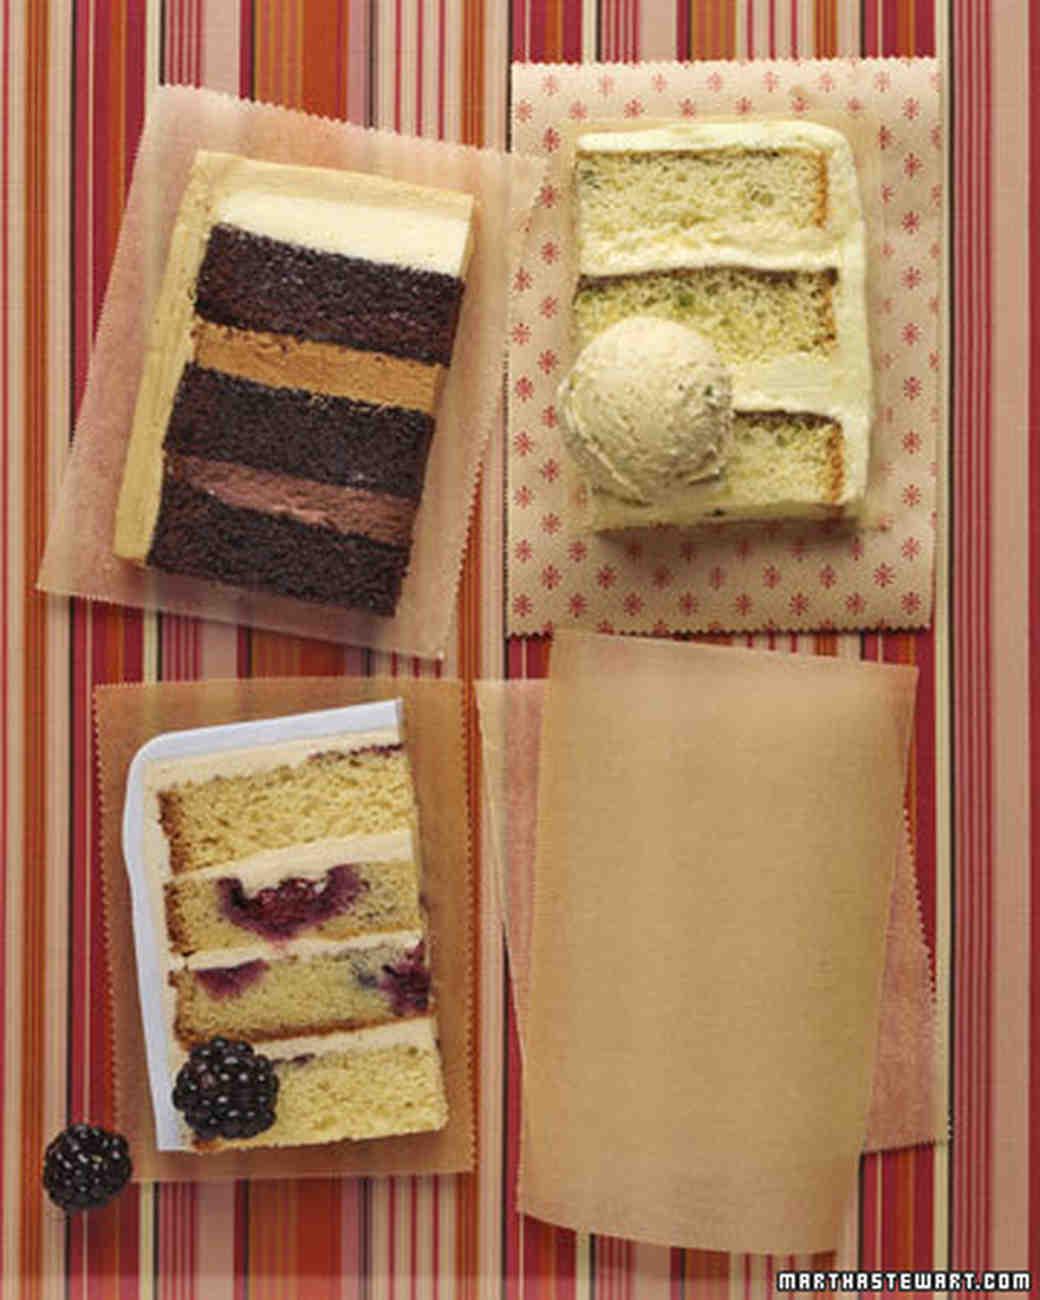 Blackberry Buttermilk Cake